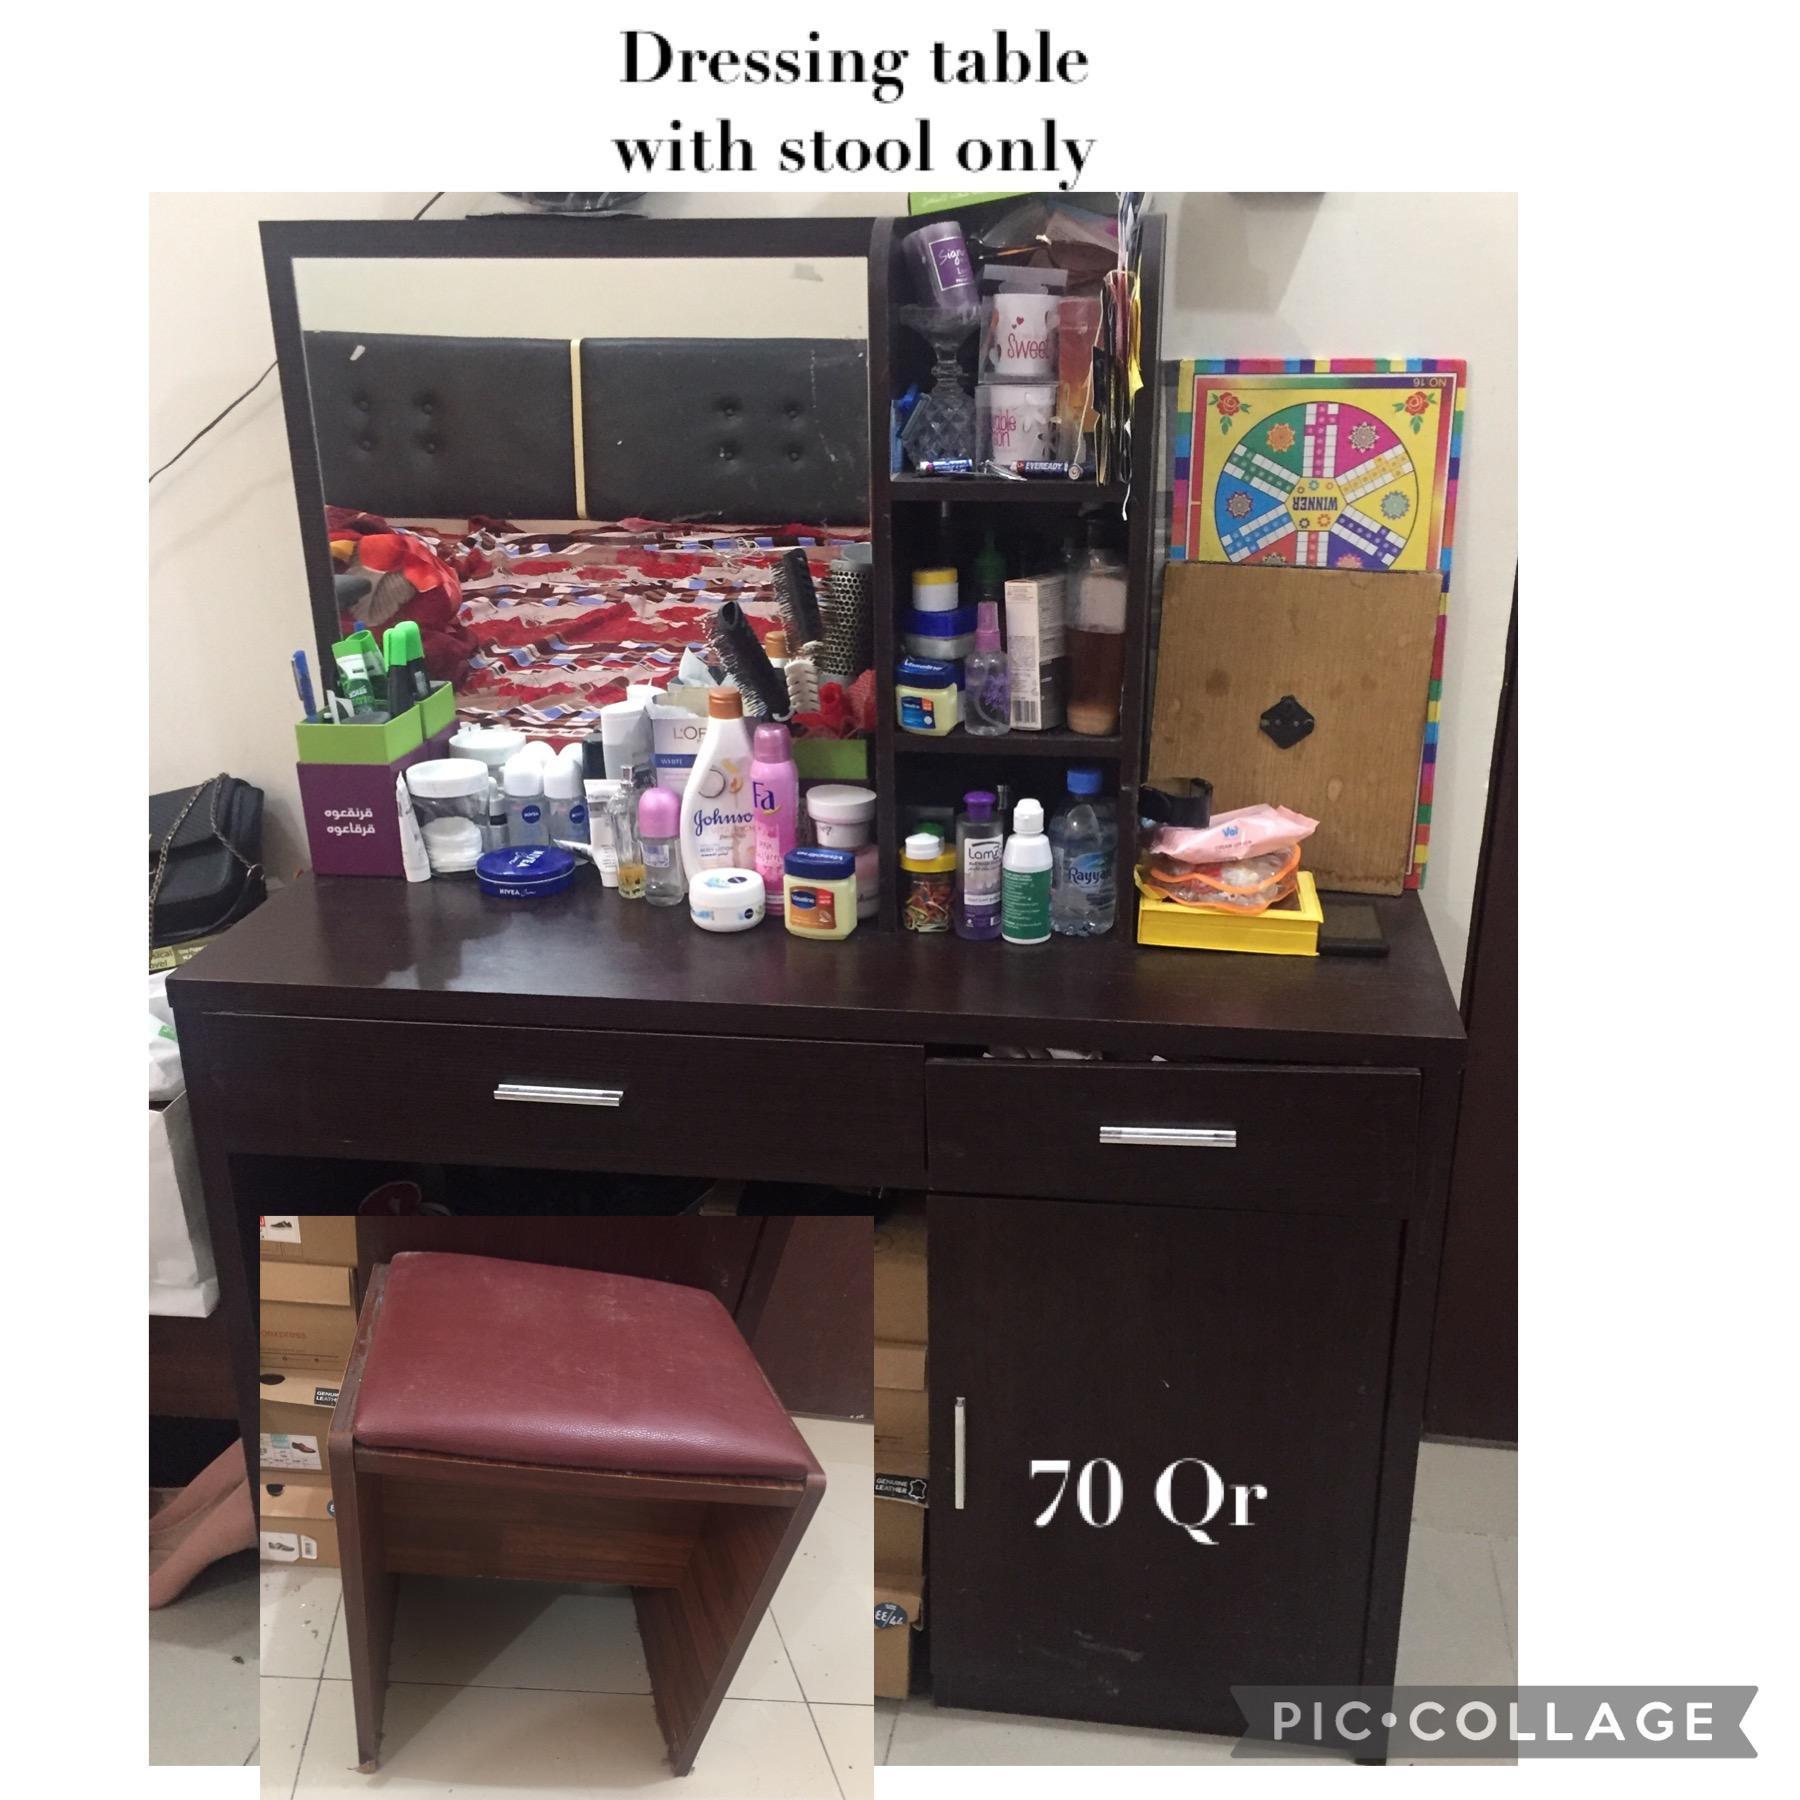 Sofa, dresser, iron stand, price negotiable